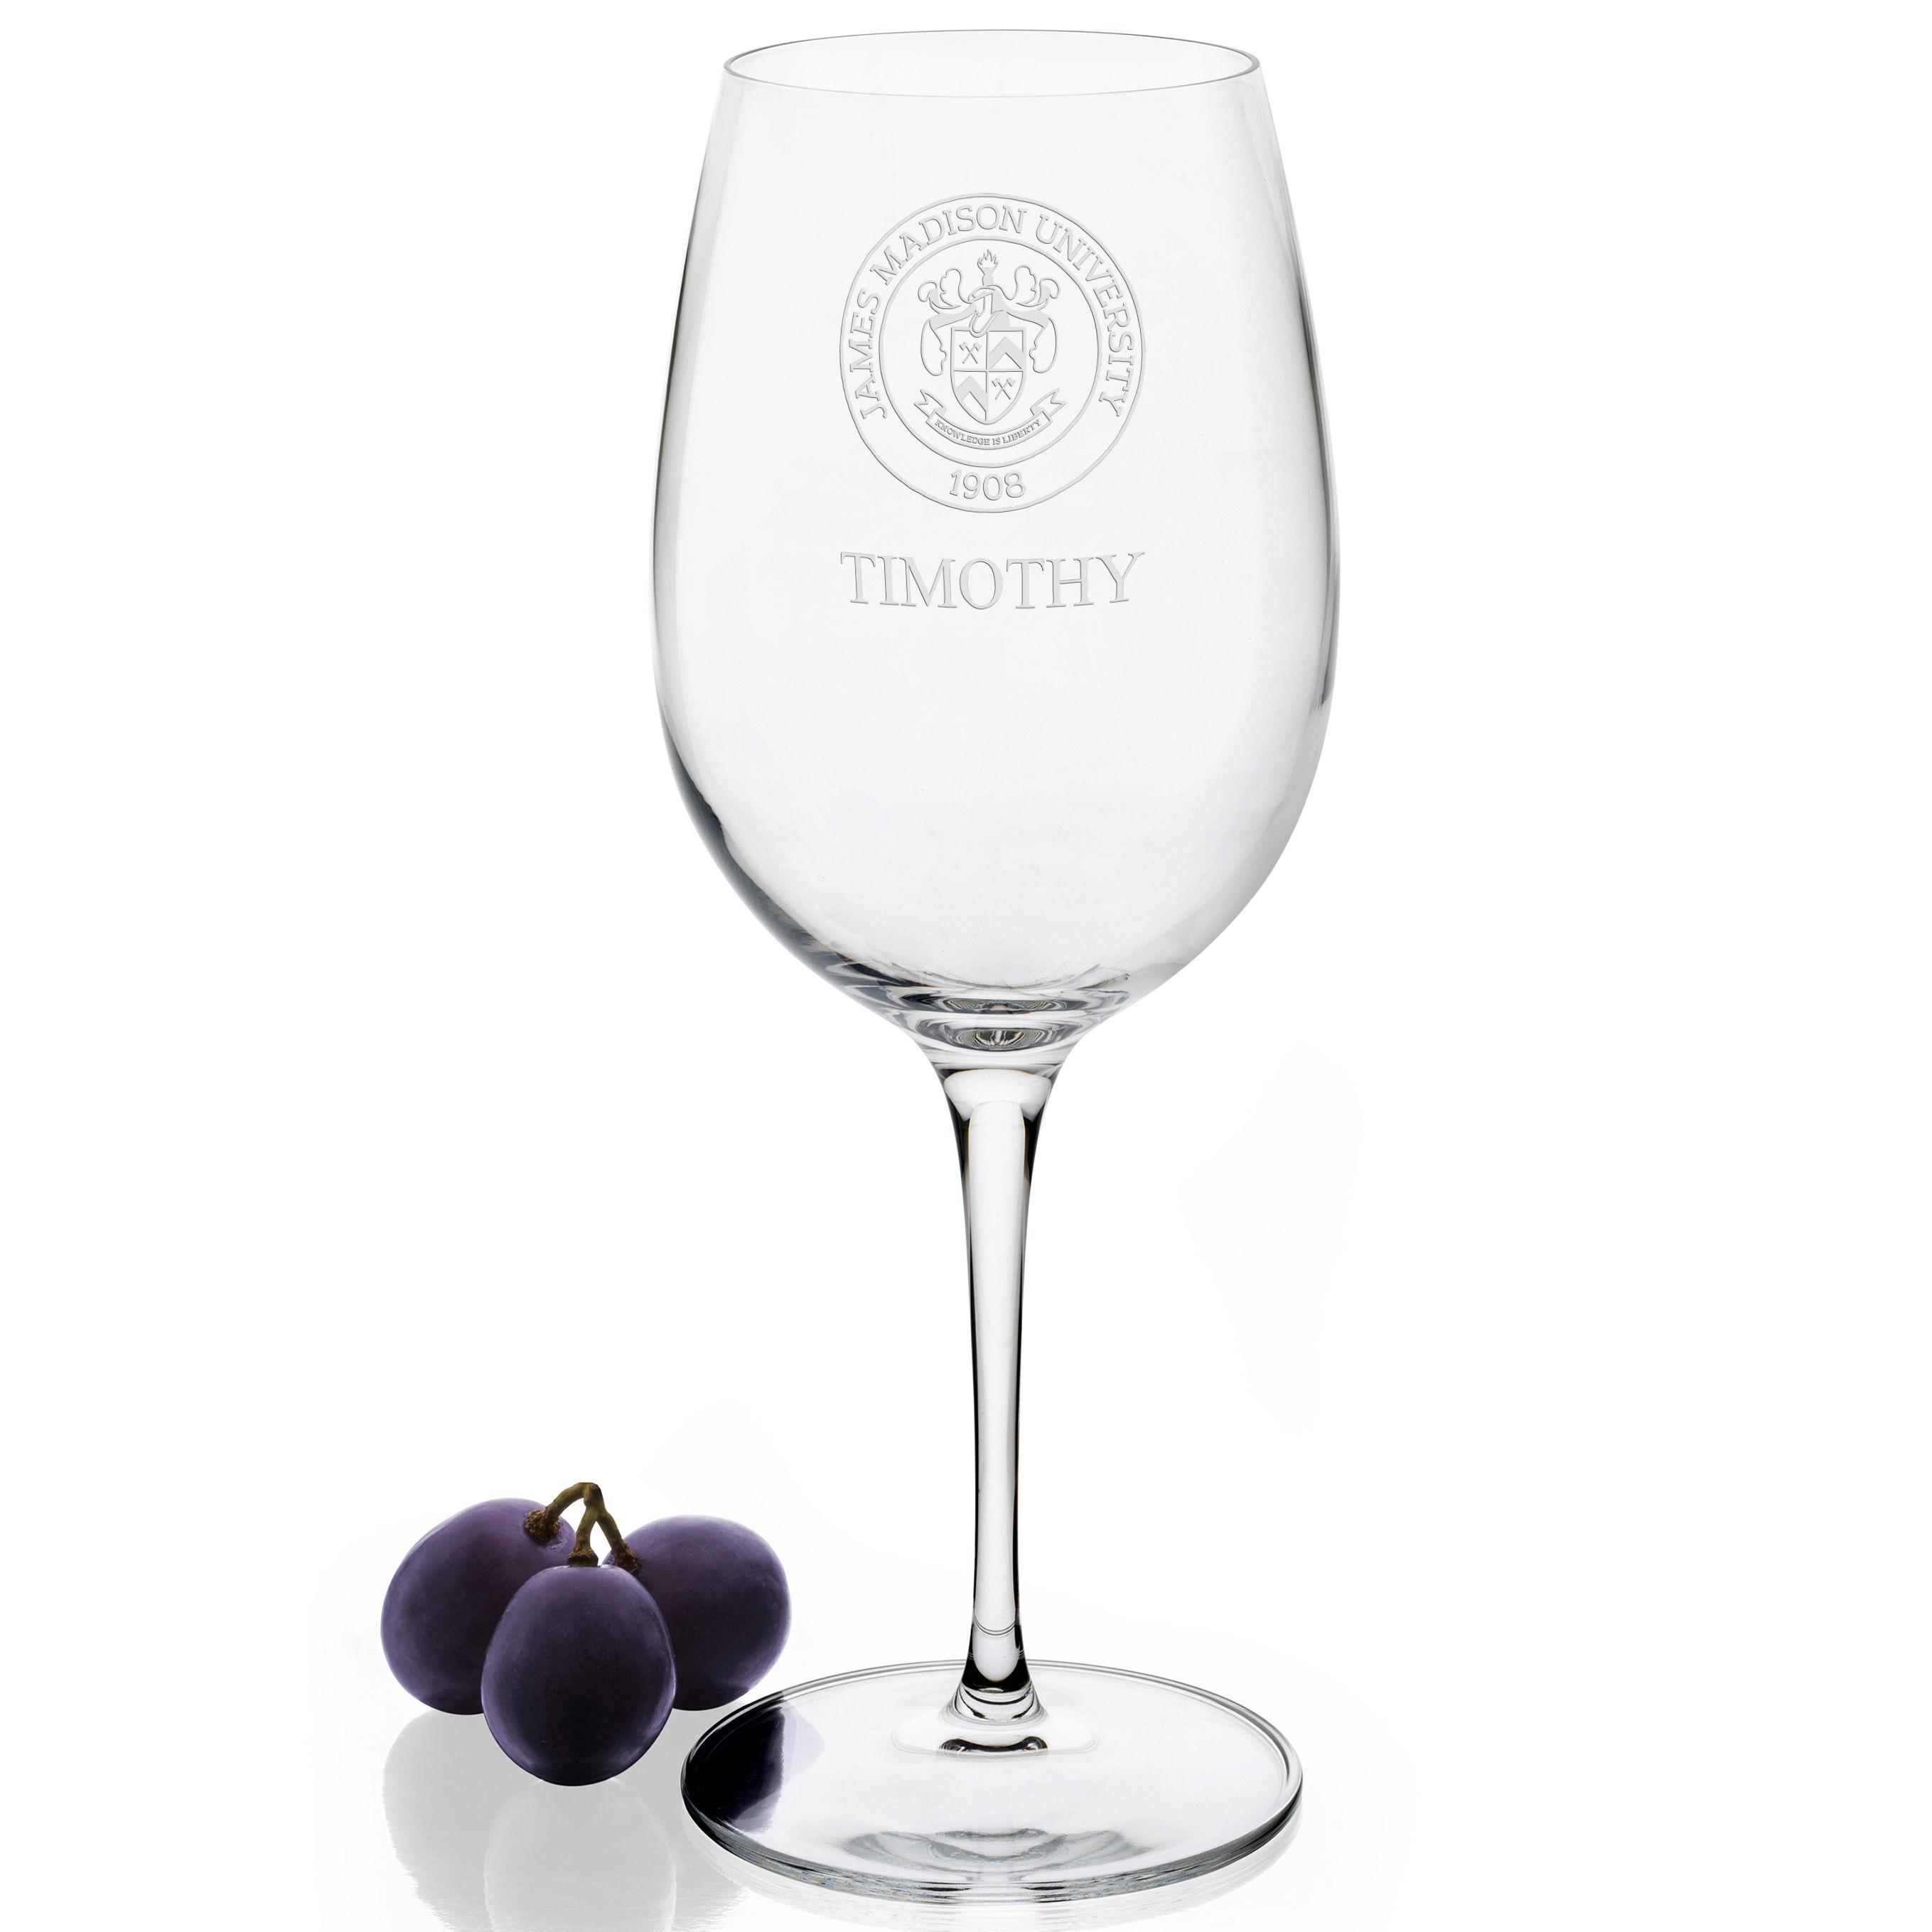 James Madison University Red Wine Glasses - Set of 2 - Image 2